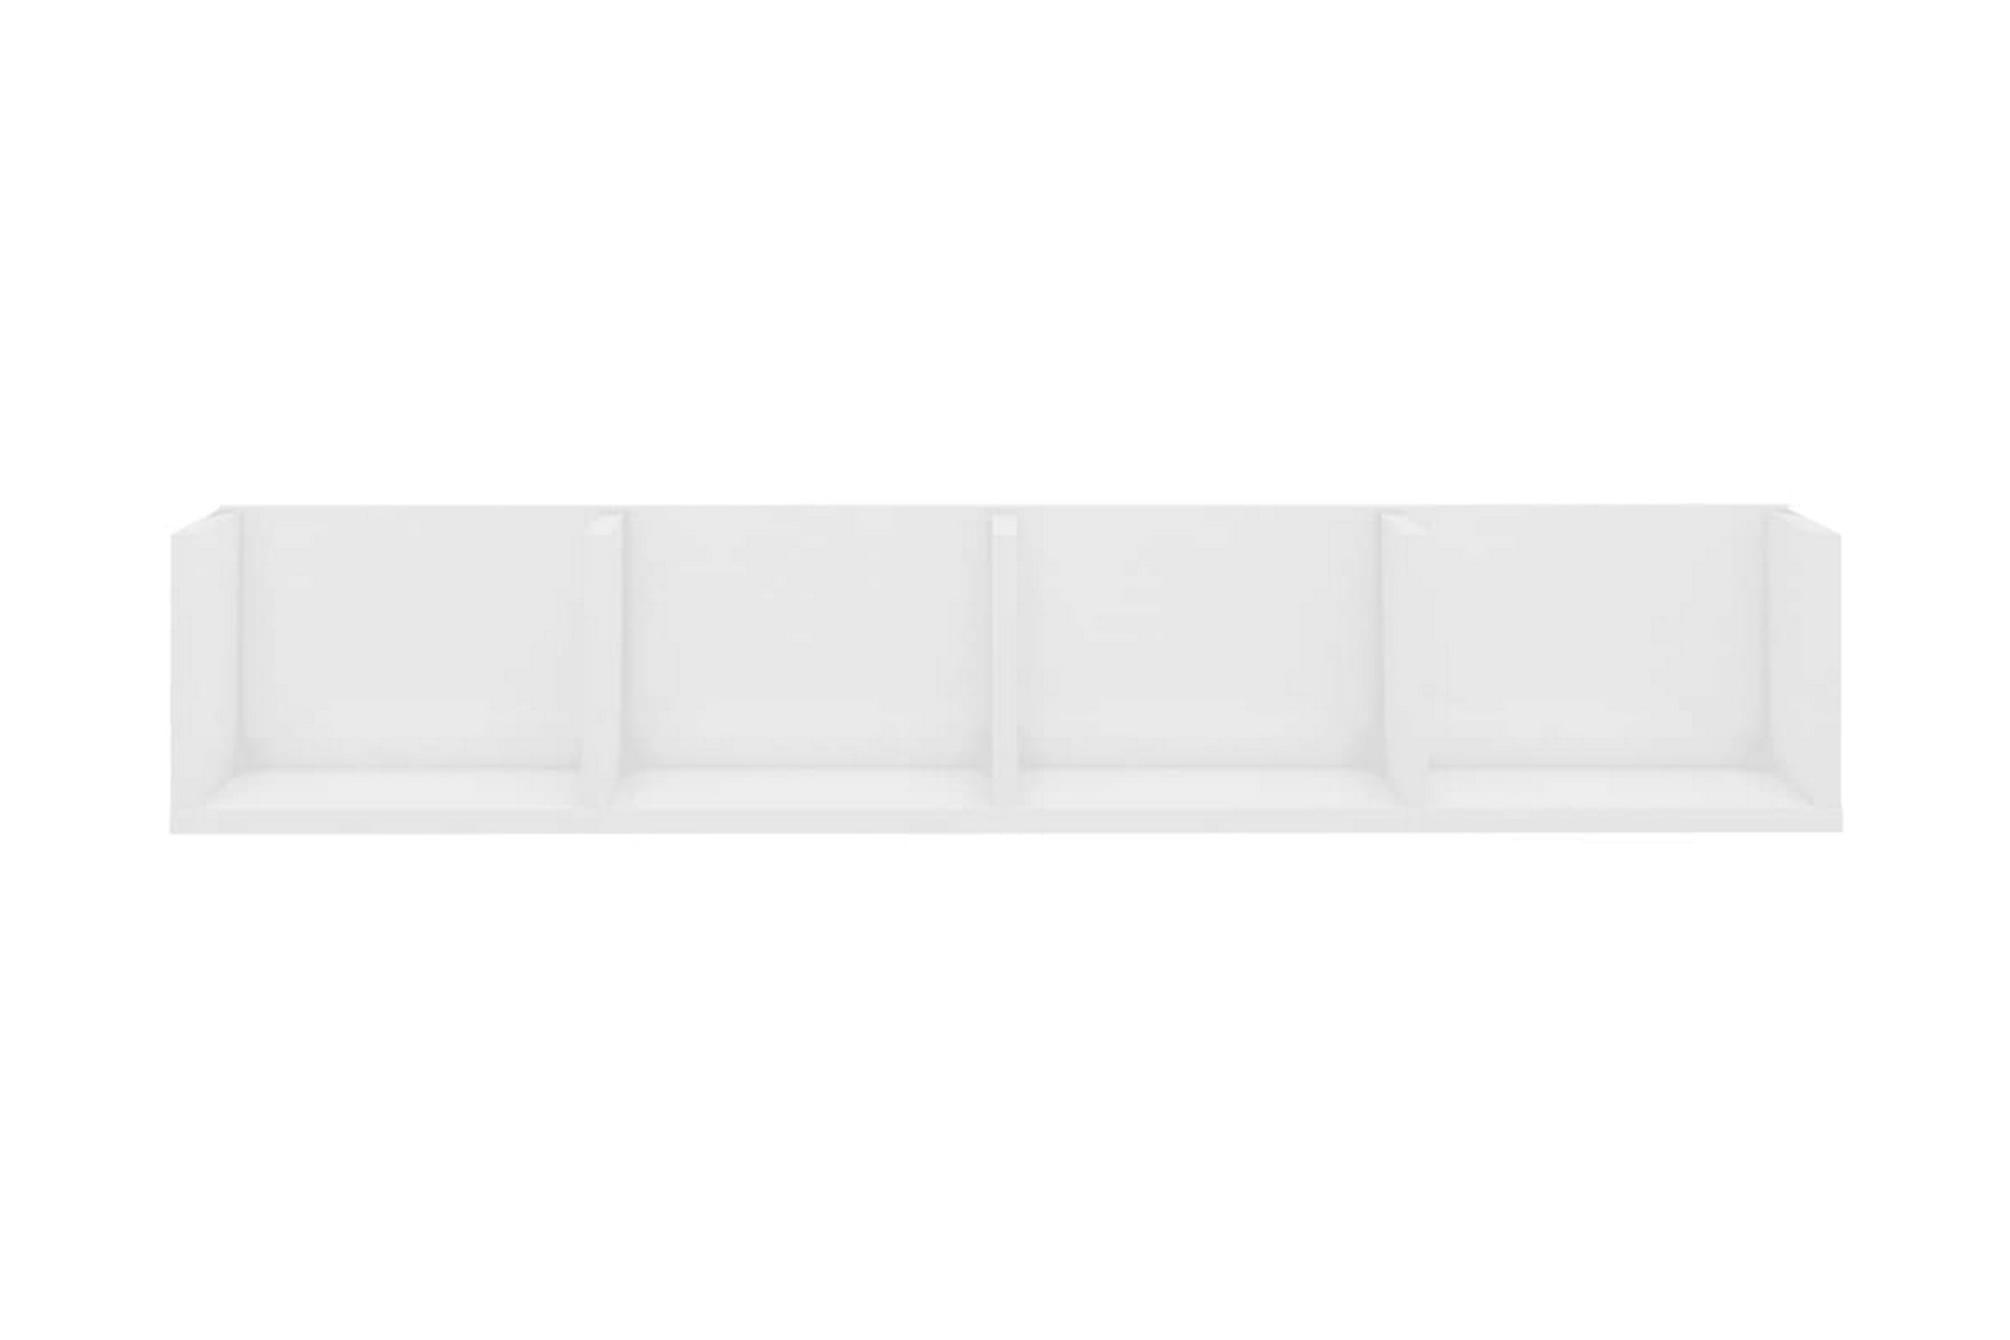 CD-hylla vit högglans 100x18x18 cm spånskiva, Hylla